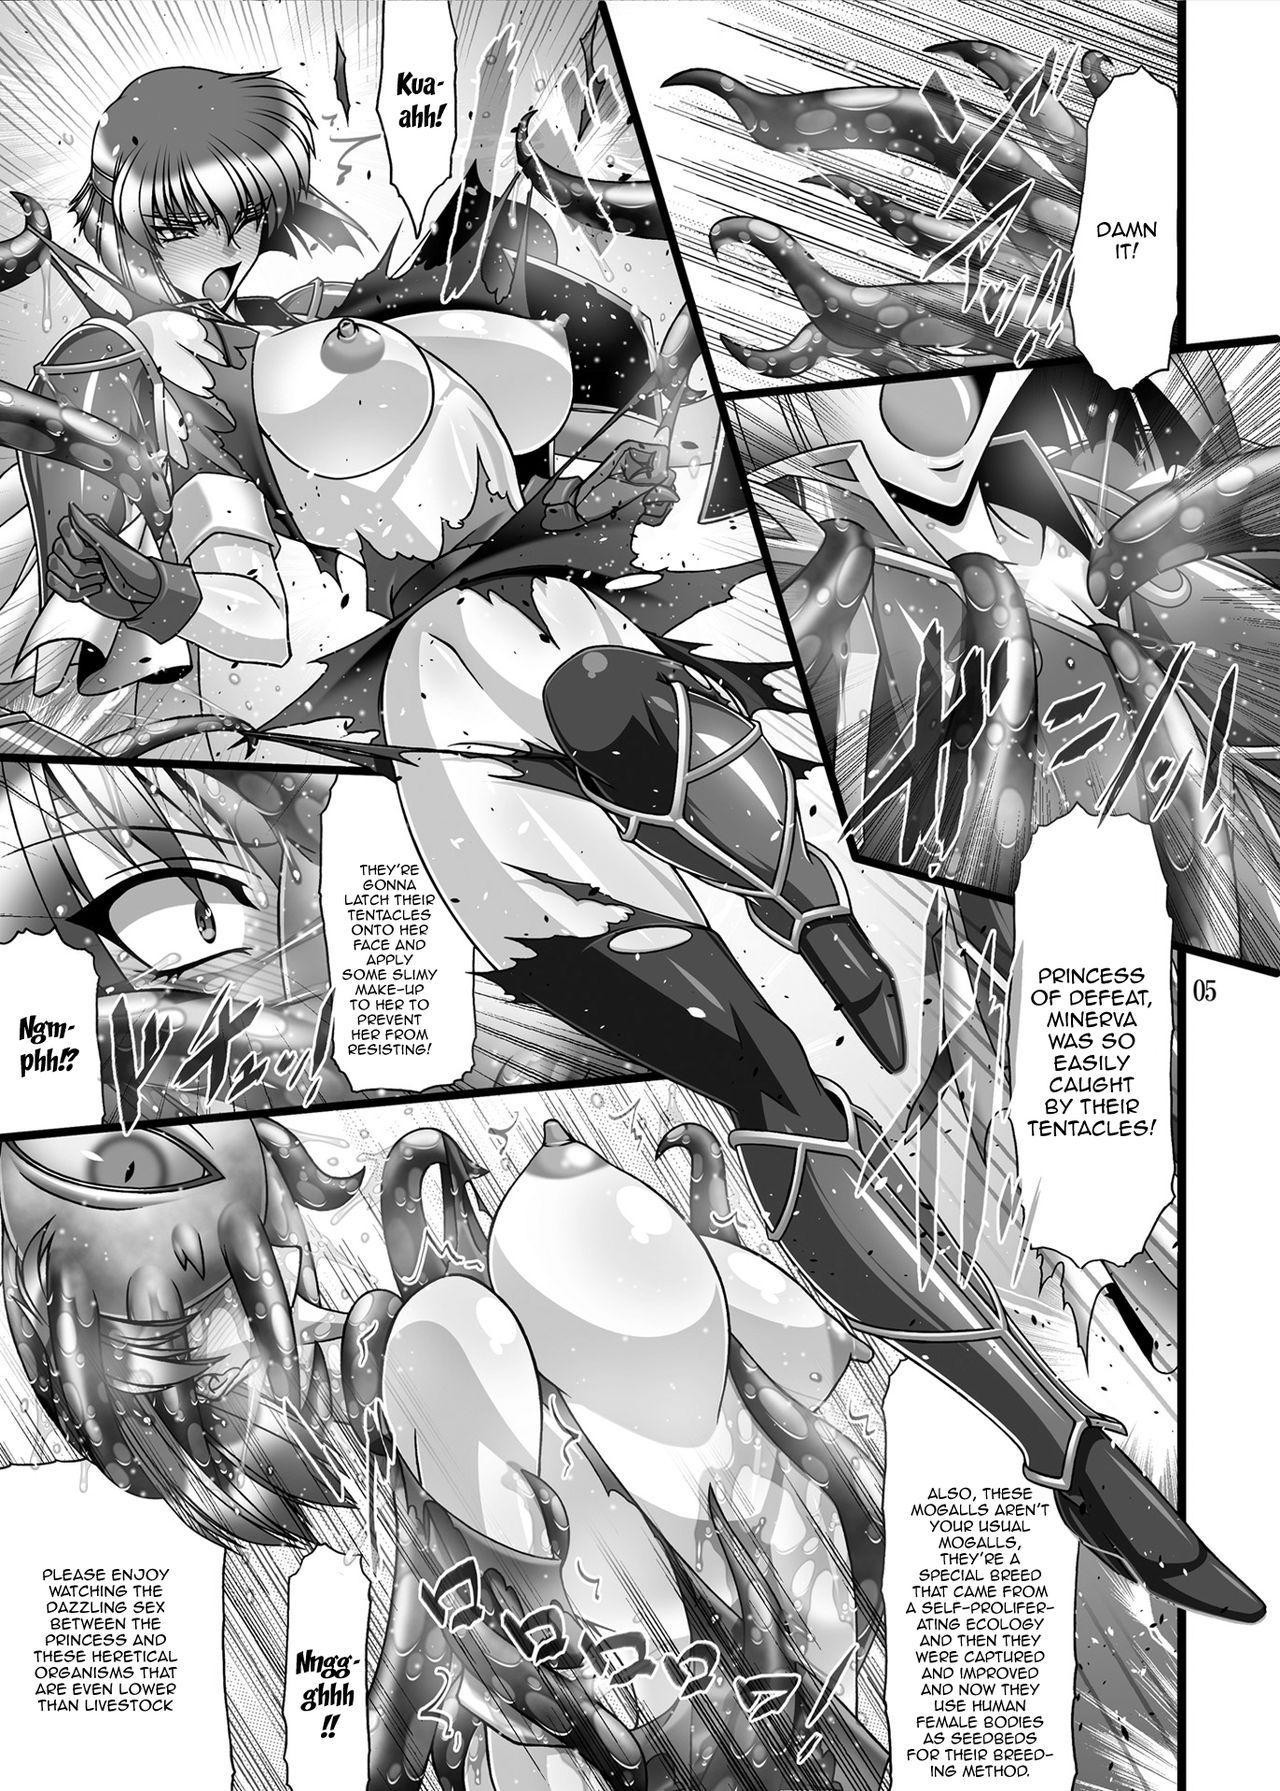 Oshi Chara Emblem | Favorite Emblem Characters 3